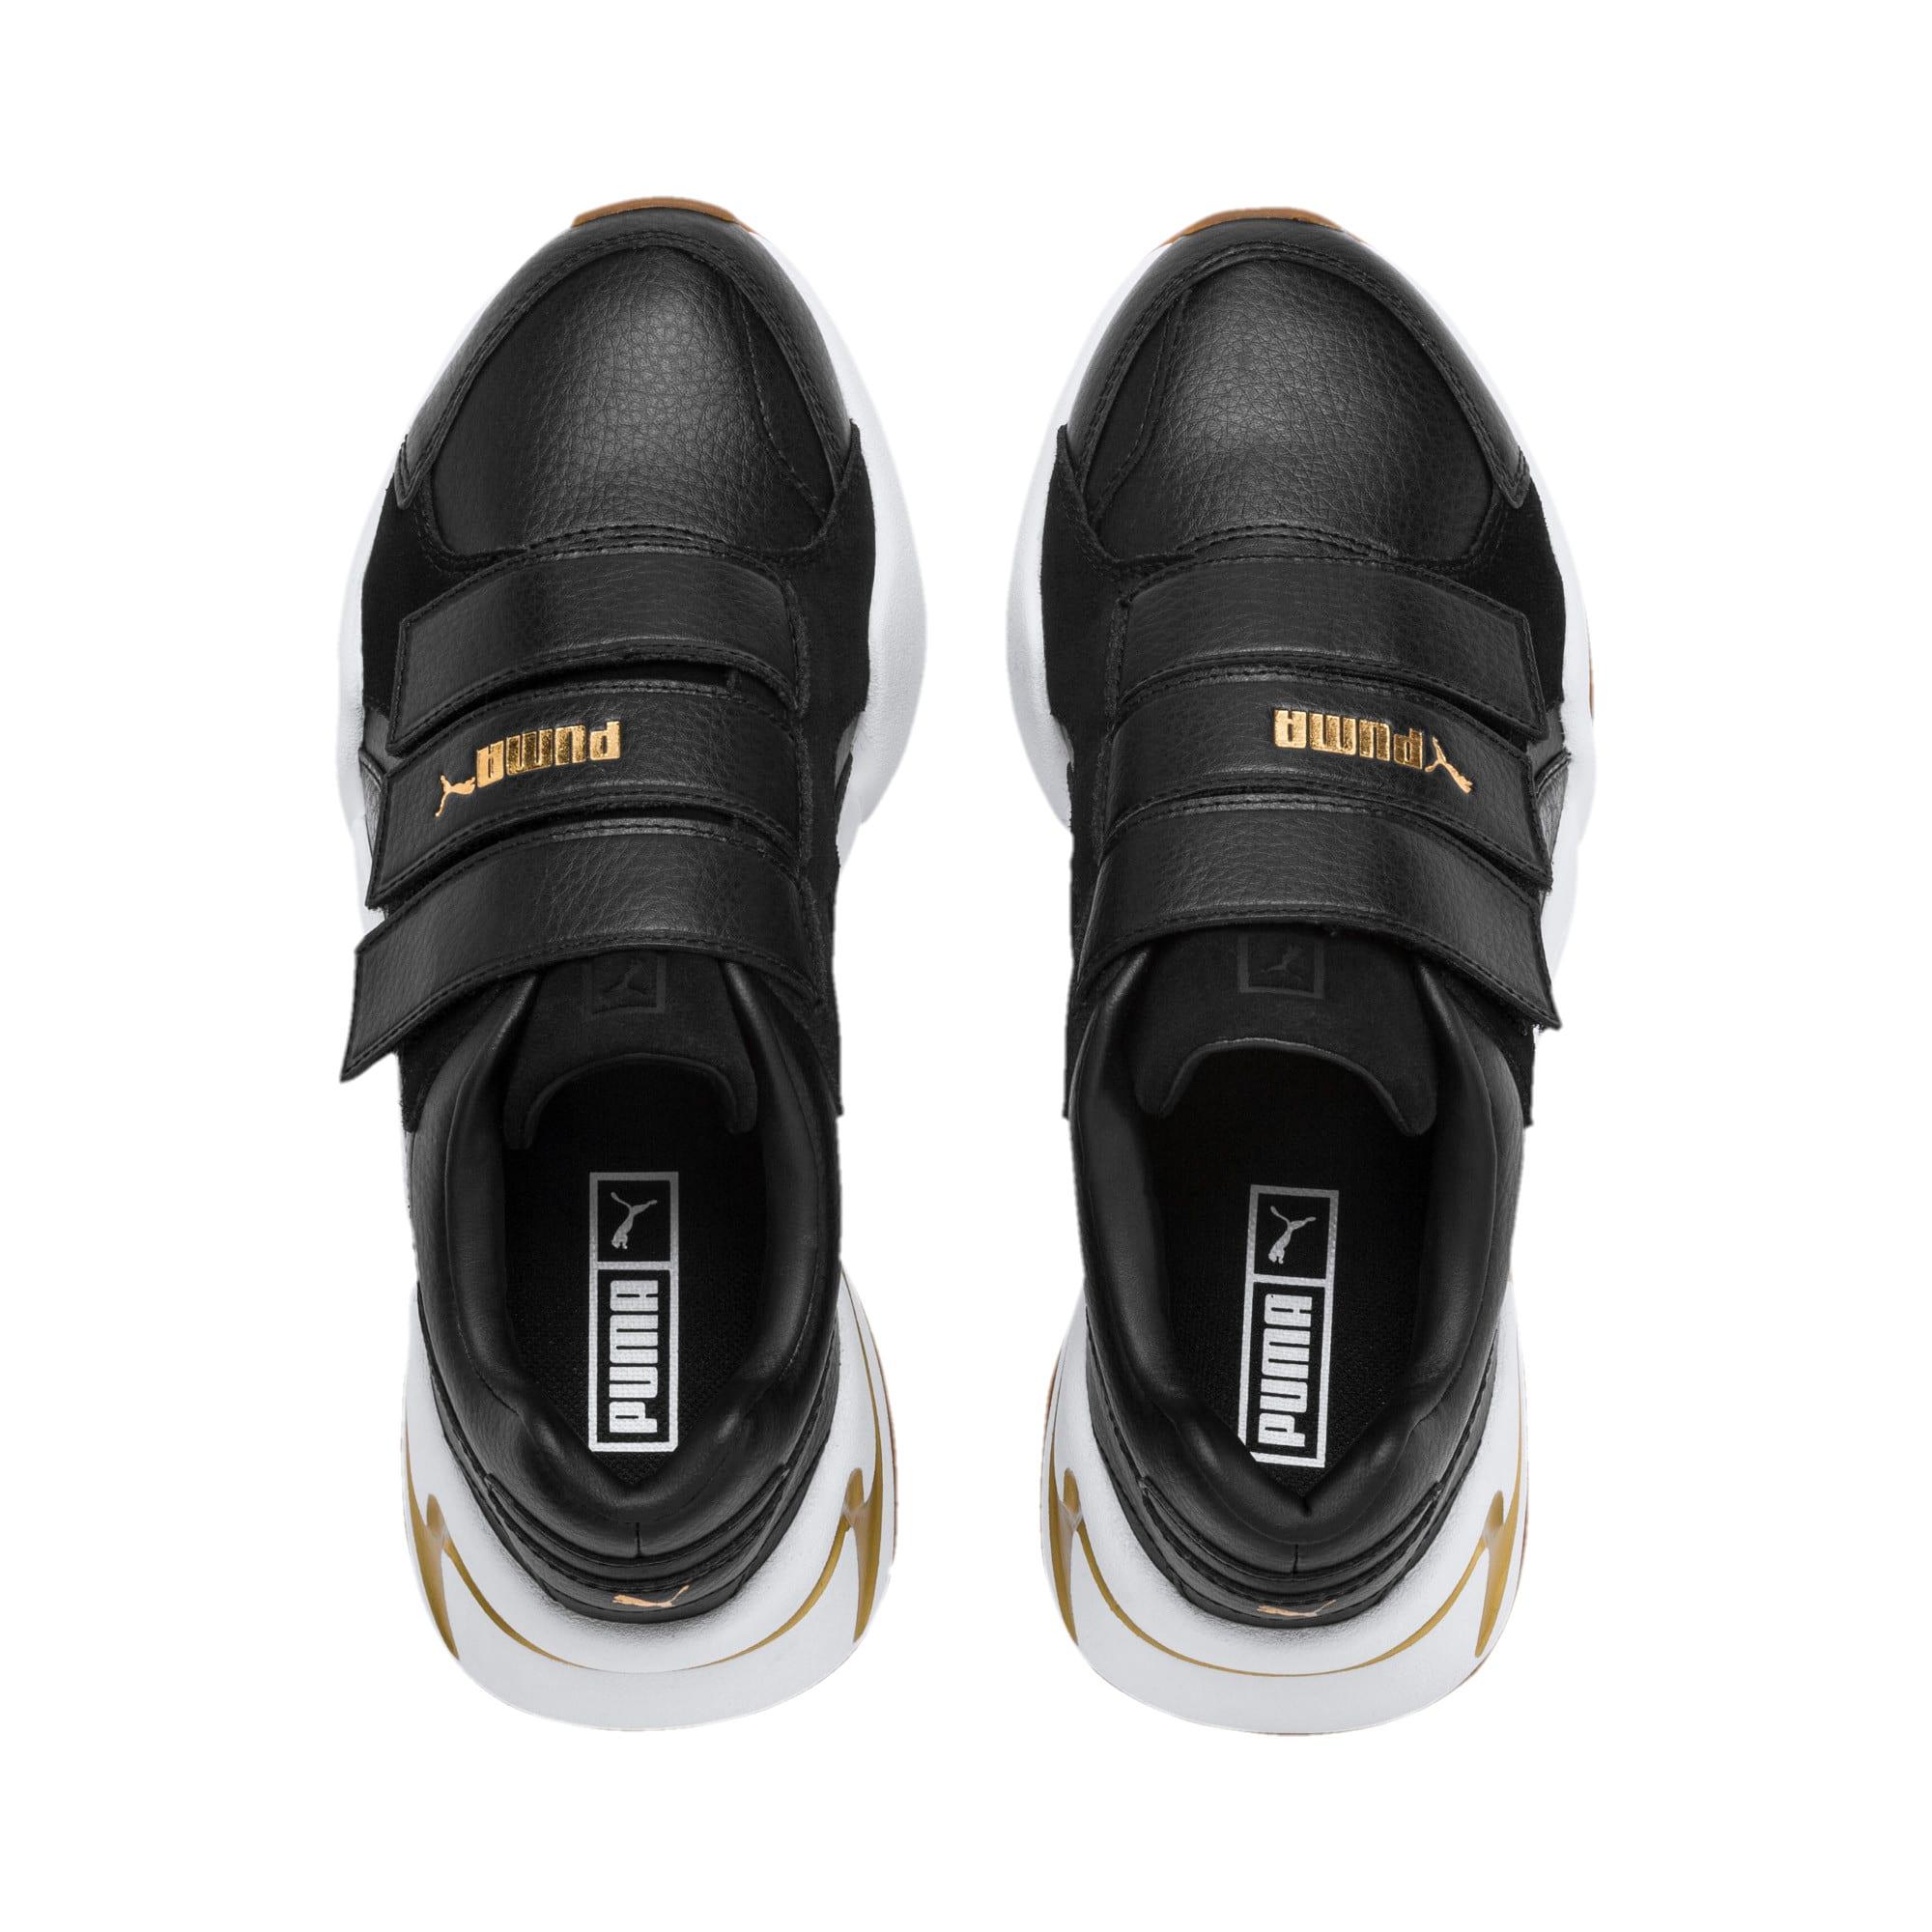 Thumbnail 7 of Nova V sportschoenen van leer voor dames, Puma Black-Puma Team Gold, medium